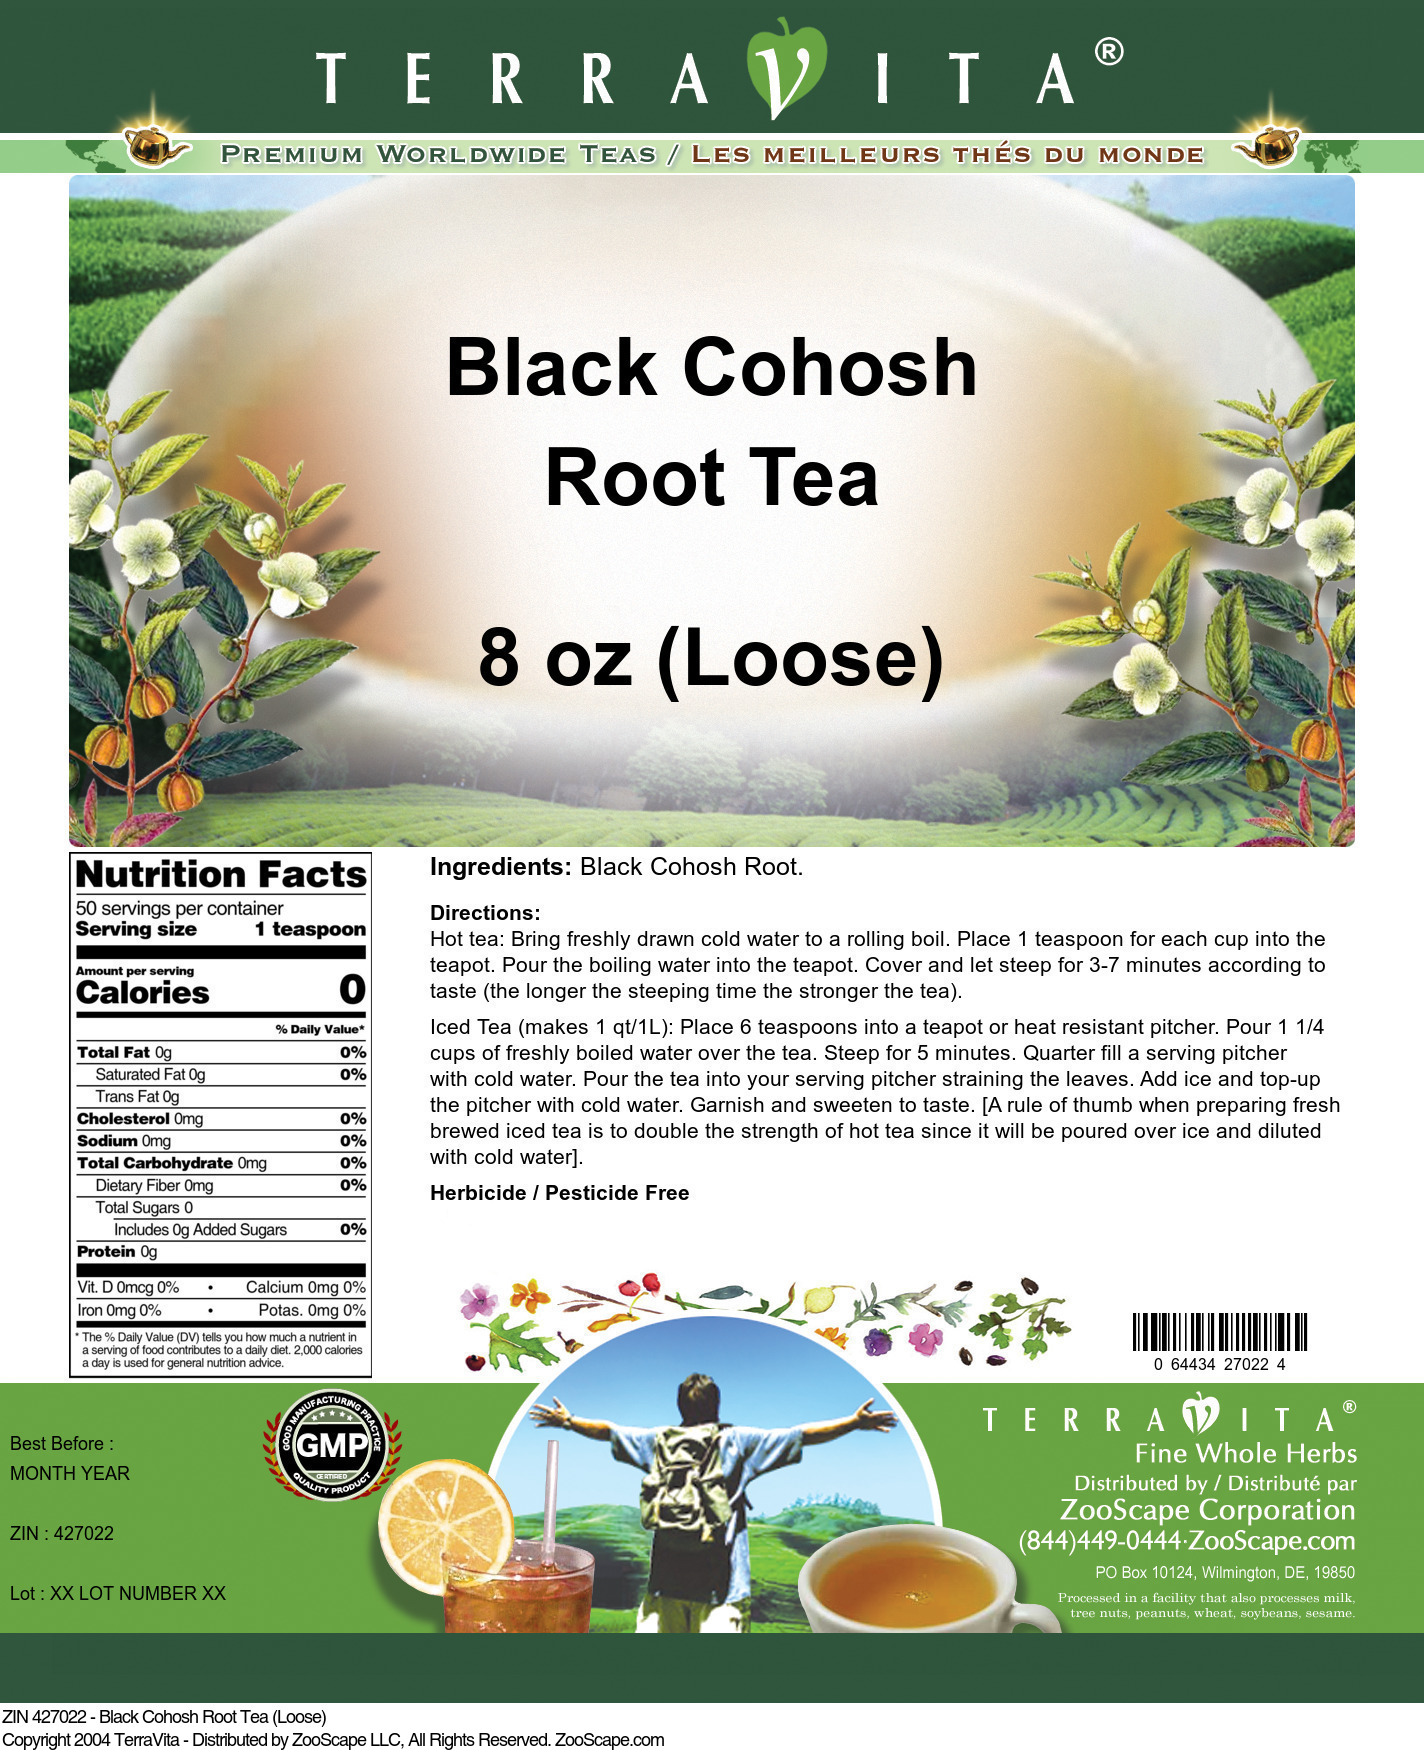 Black Cohosh Root Tea (Loose) - Label